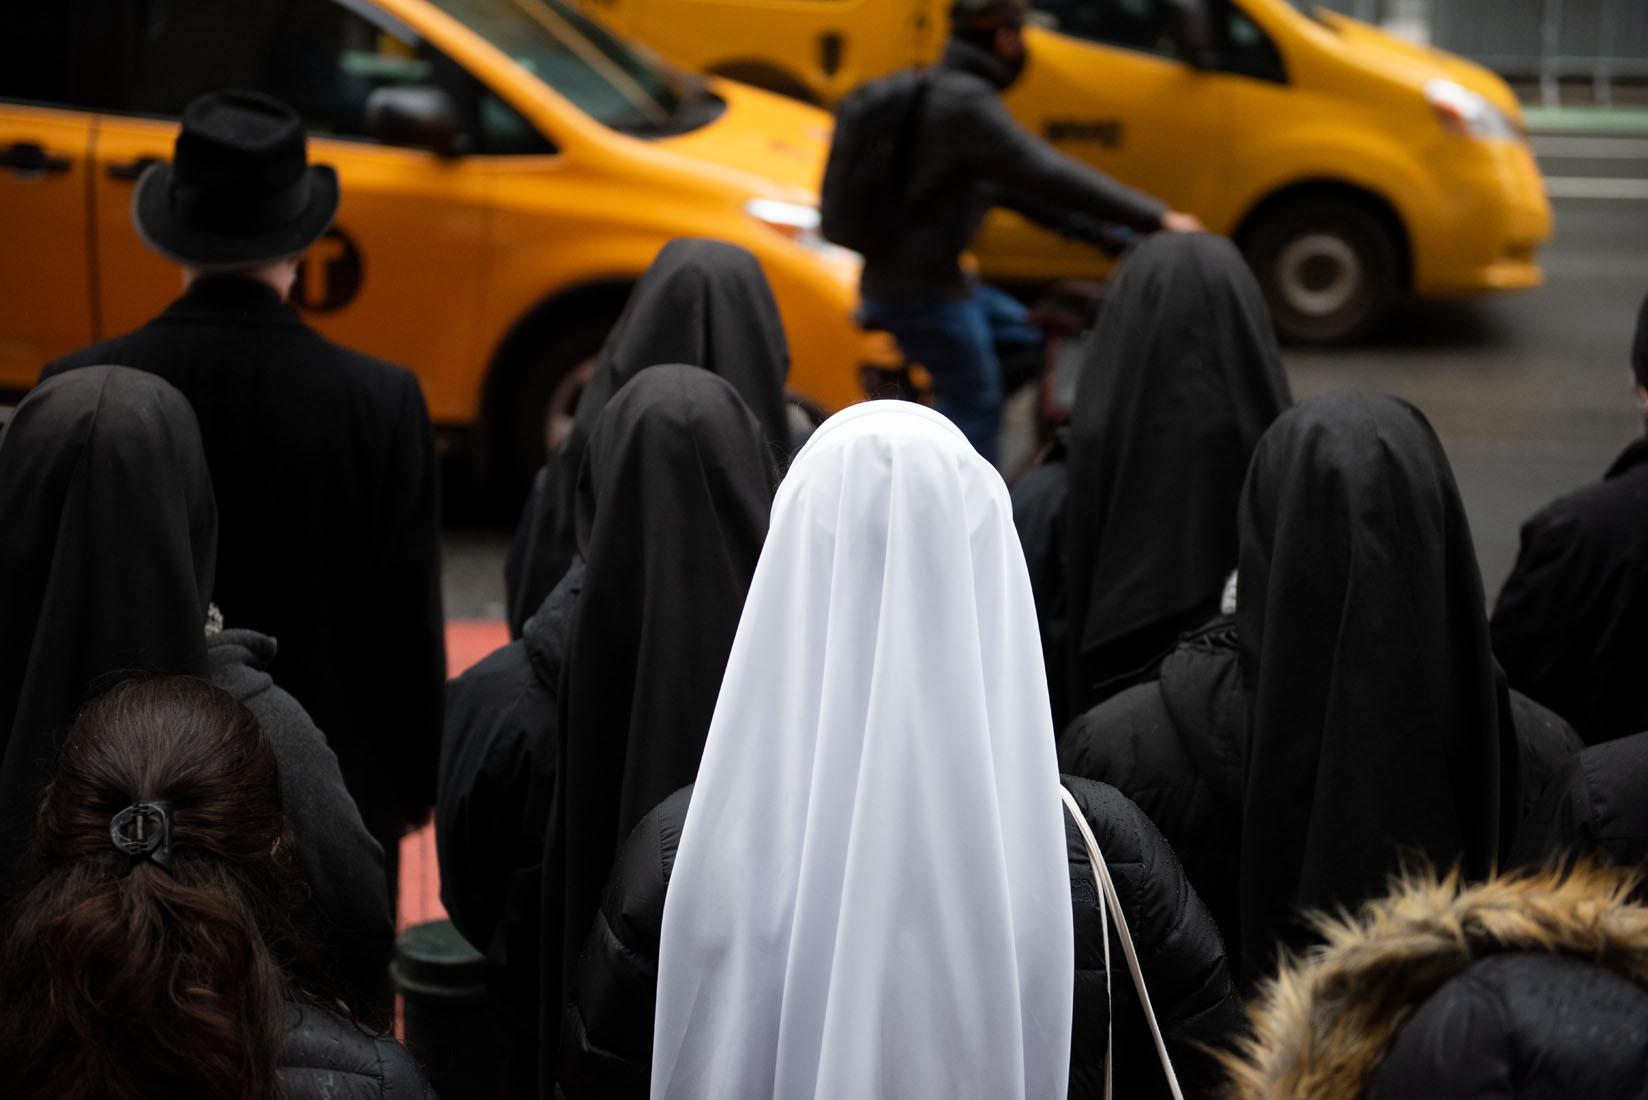 SISTERS NUNS NEW YORK CITY